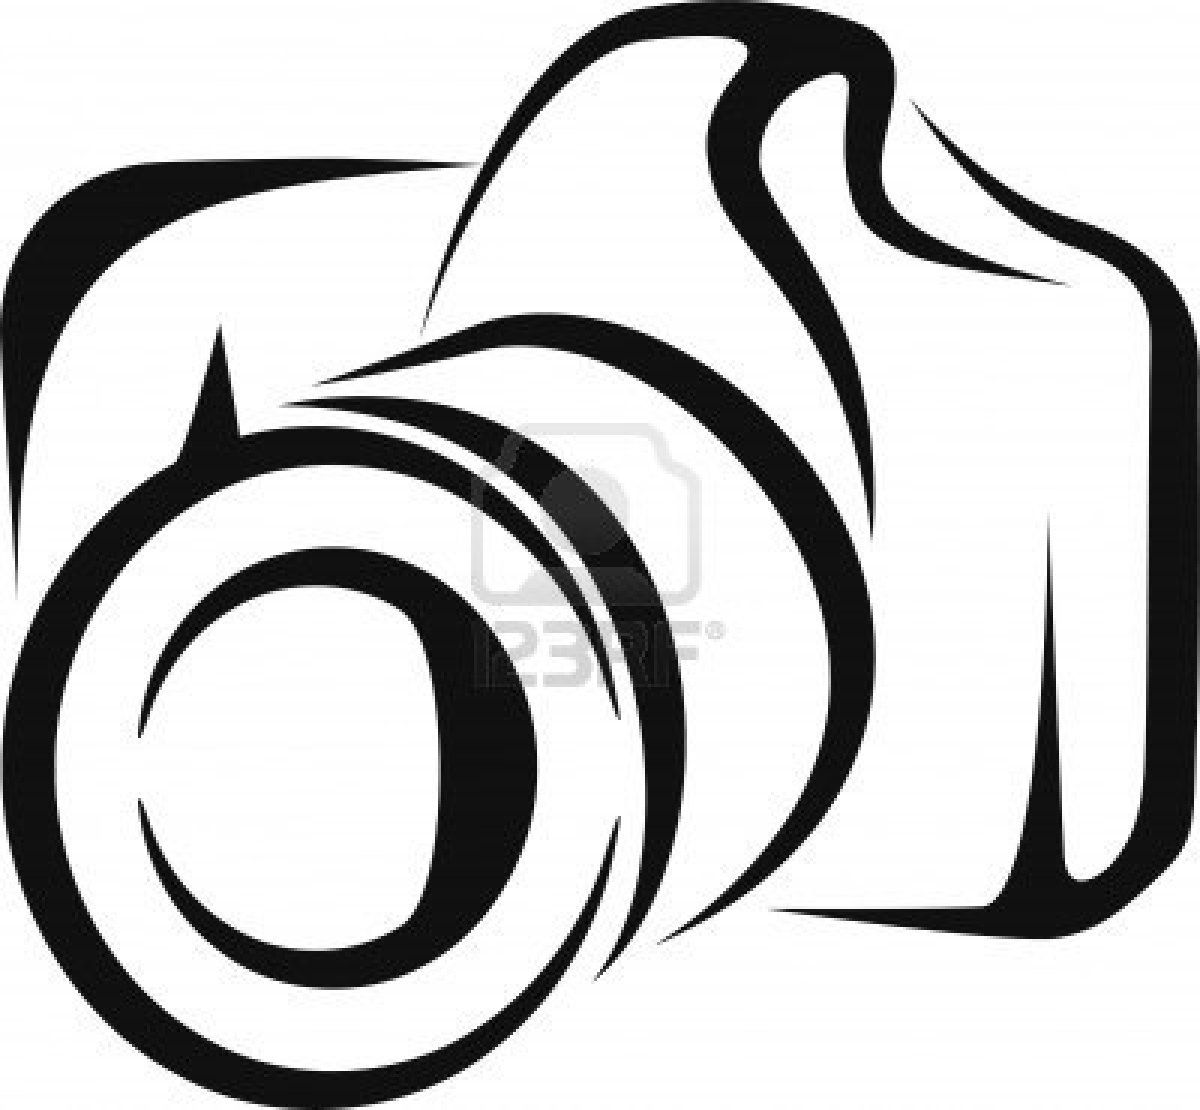 Camera Flash Animation Clipart Panda Free Clipart